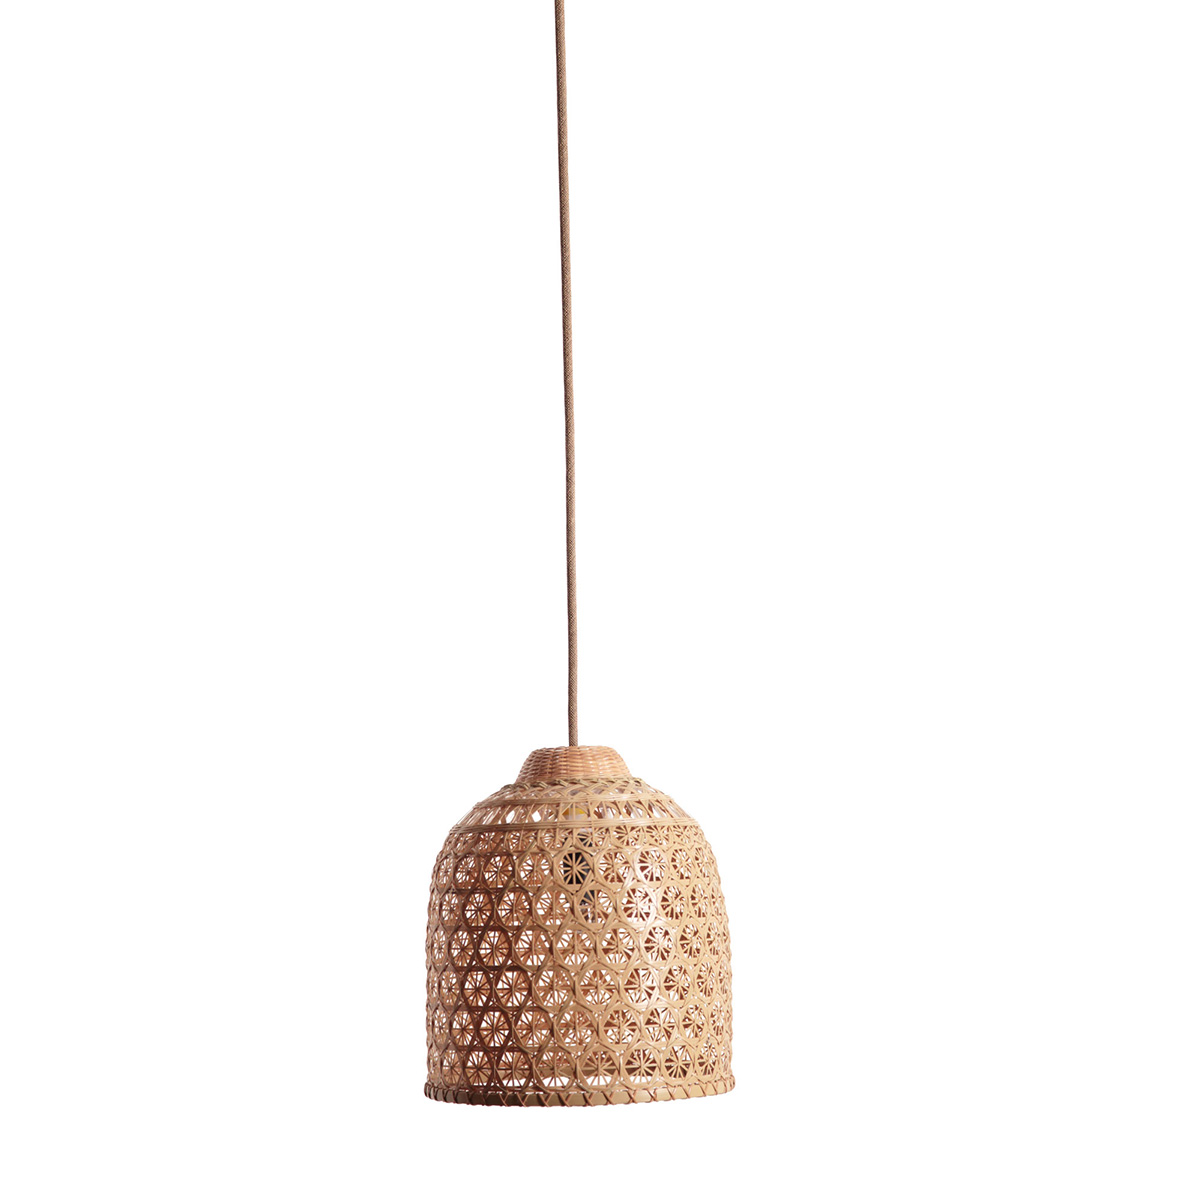 13-pet-lamp-kyoto-ayako-osogaki-alvaro-catalan-ocon